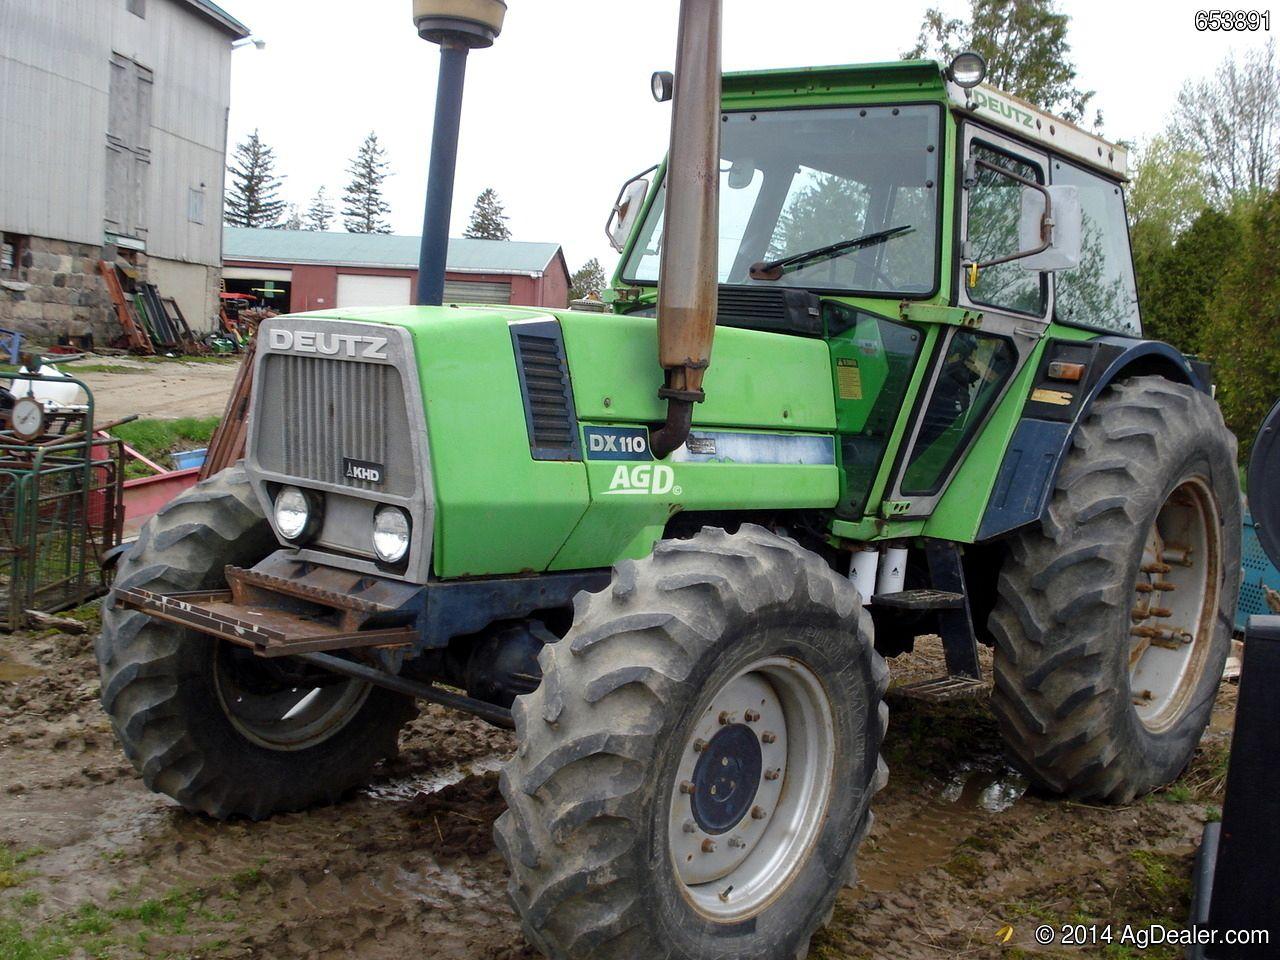 Deutz Fahr Dx 110 With Images Train Truck Tractors Tractor